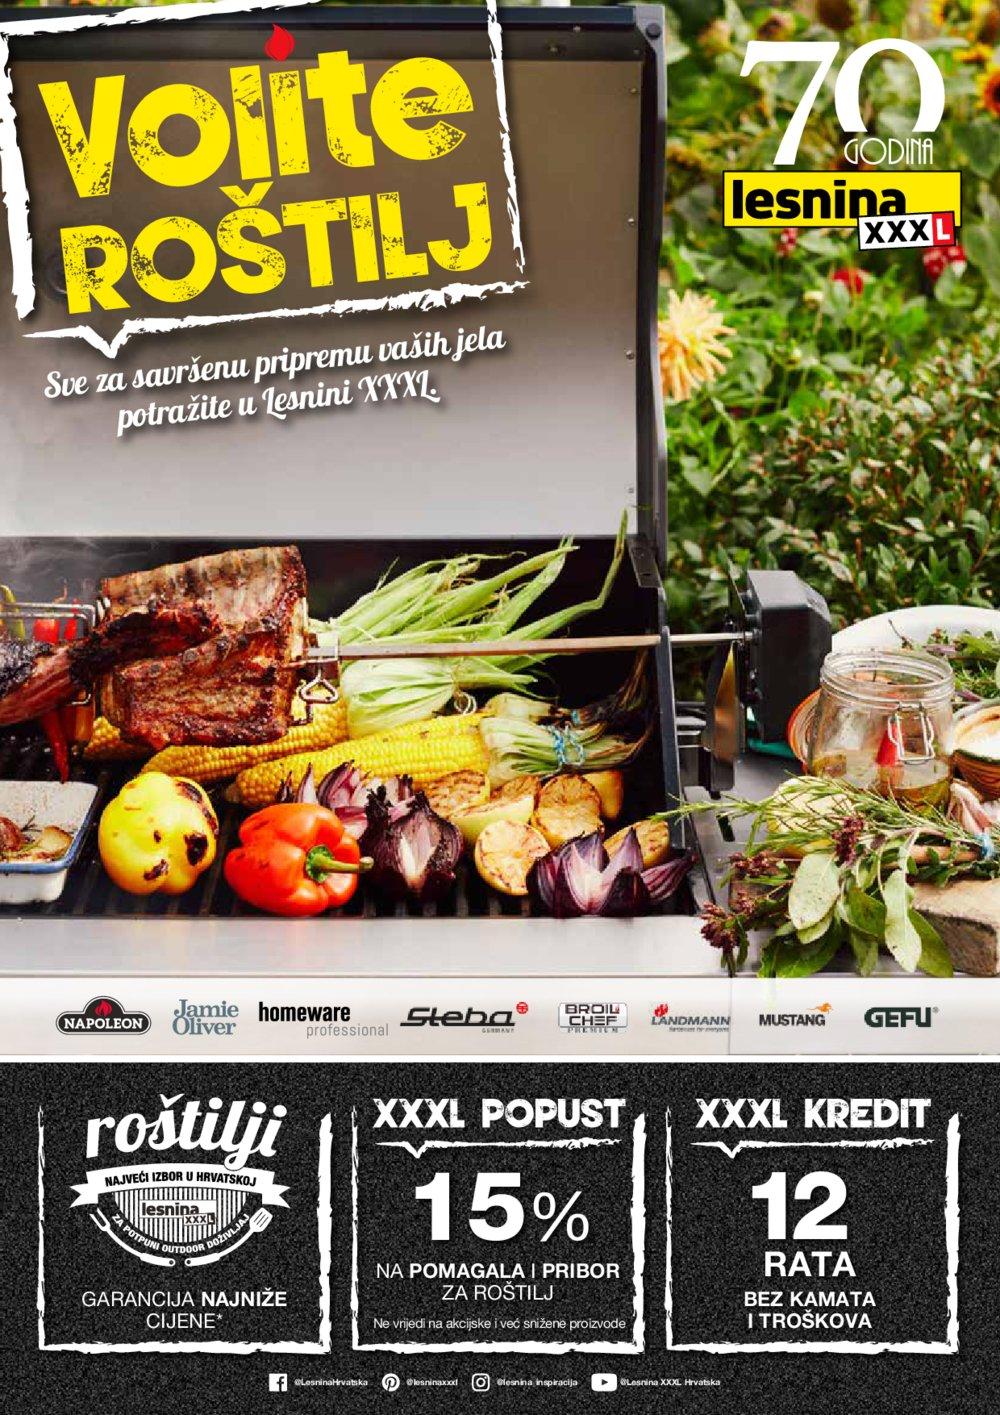 Lesnina katalog Volite roštilj 02.04.-31.05.2019.